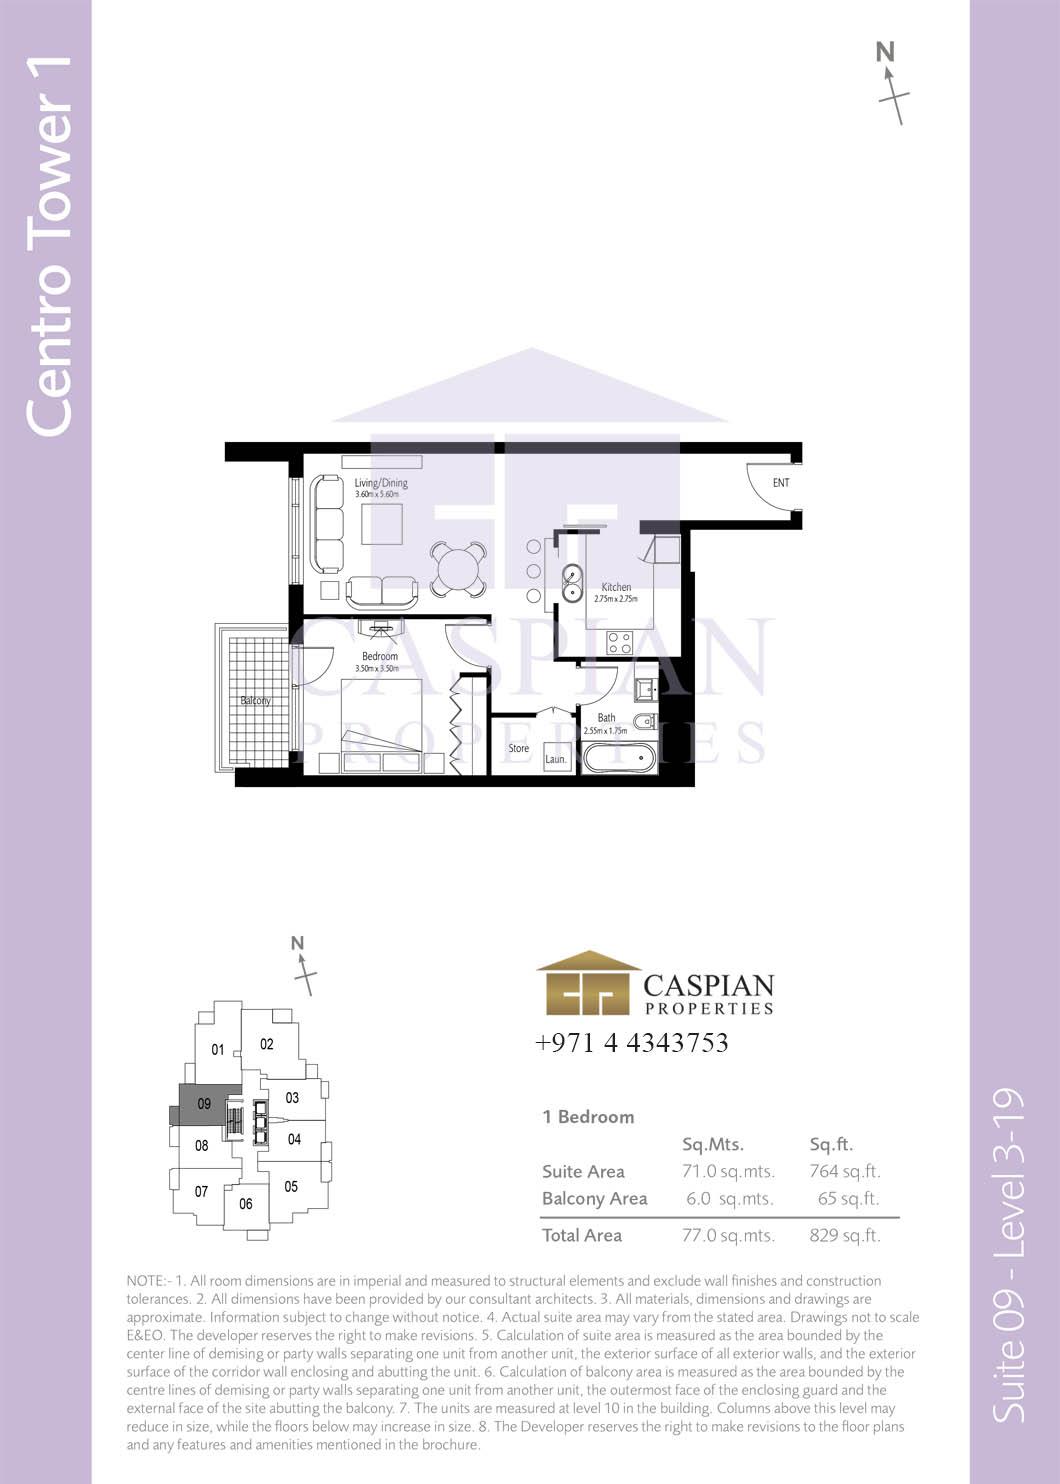 Boulevard Central Tower 1 Floor Plans